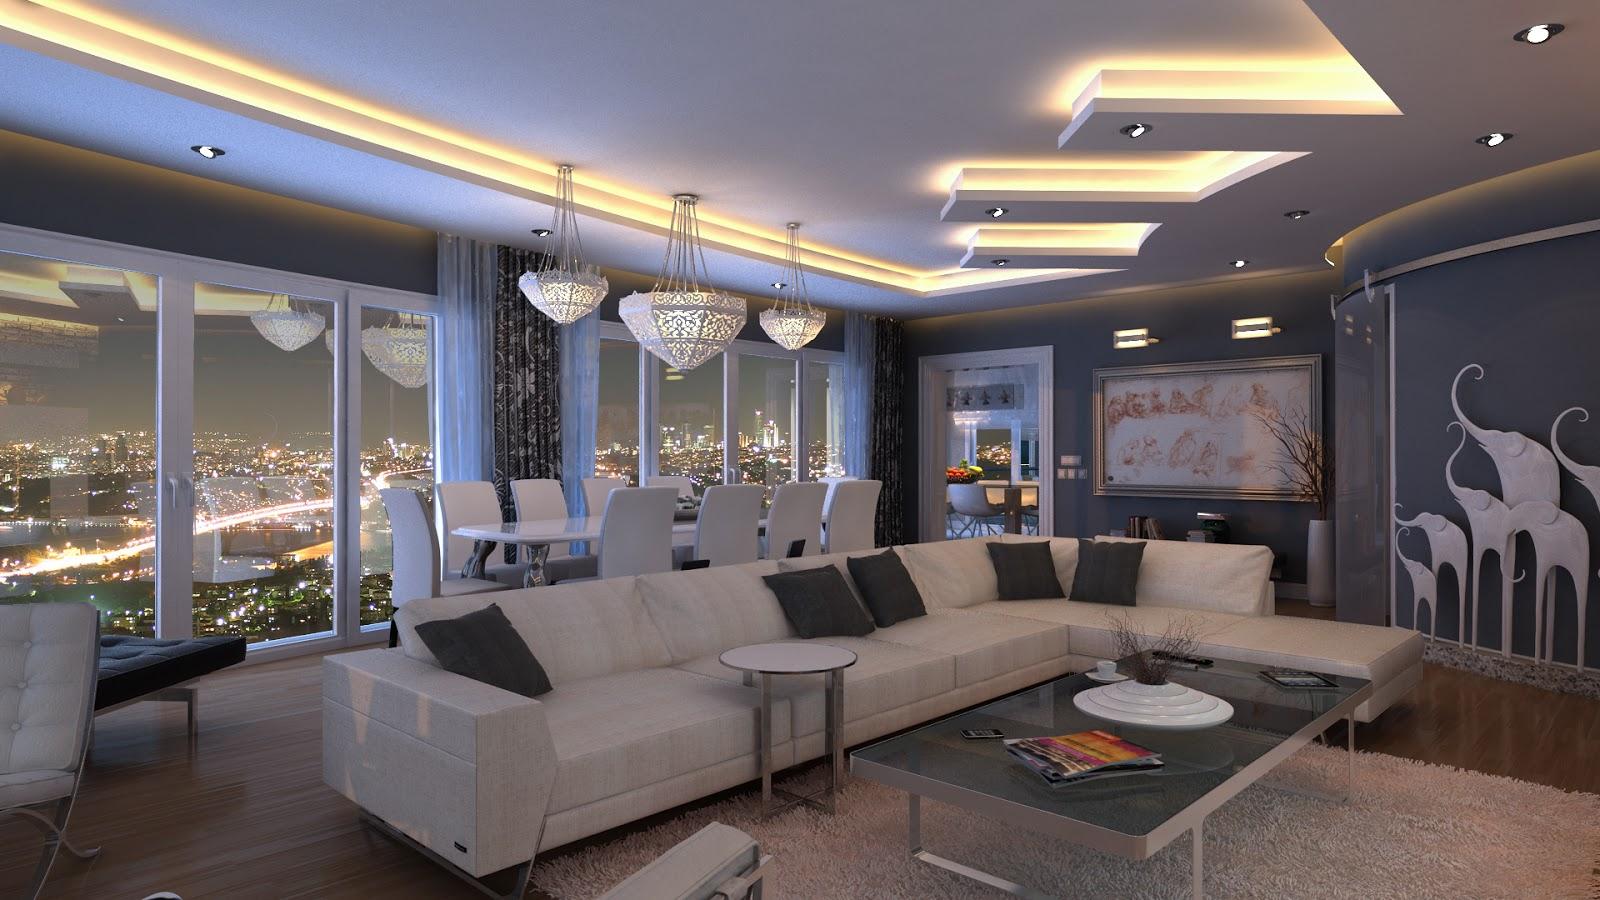 Fondos hd wallpapers fondo de pantalla salon de lujo en - Salones de lujo ...